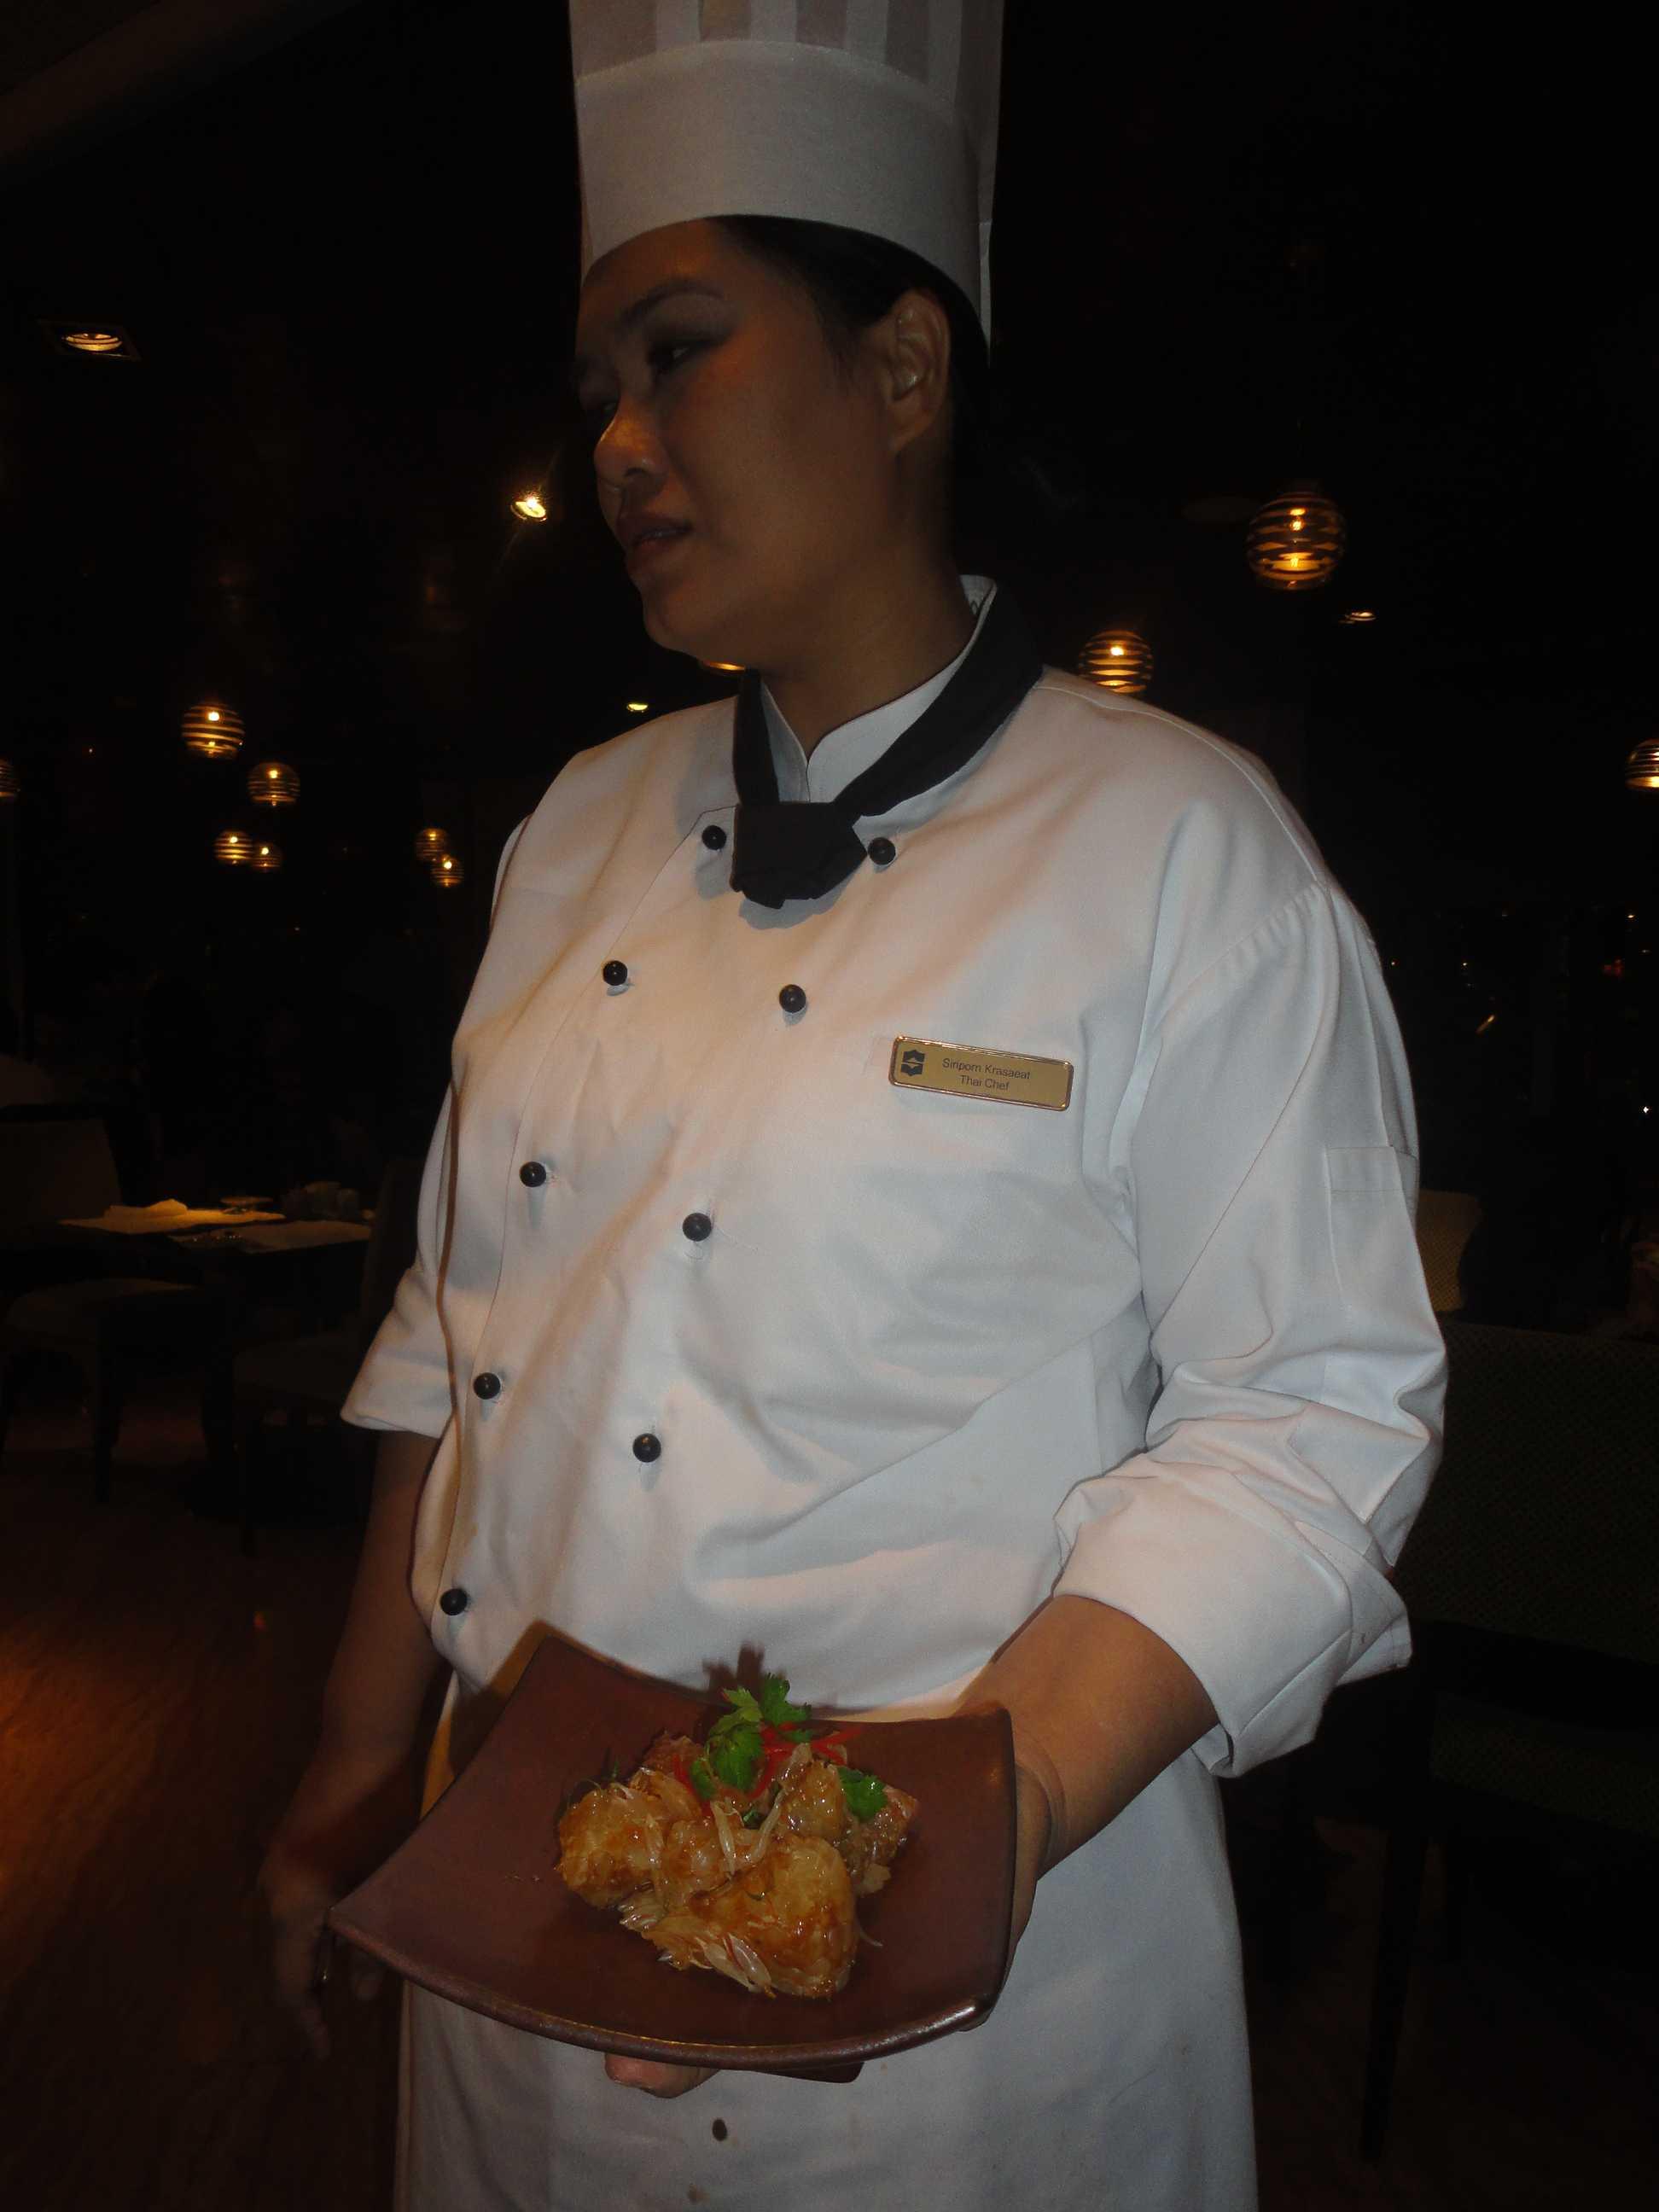 Chef Joy-fnbworld